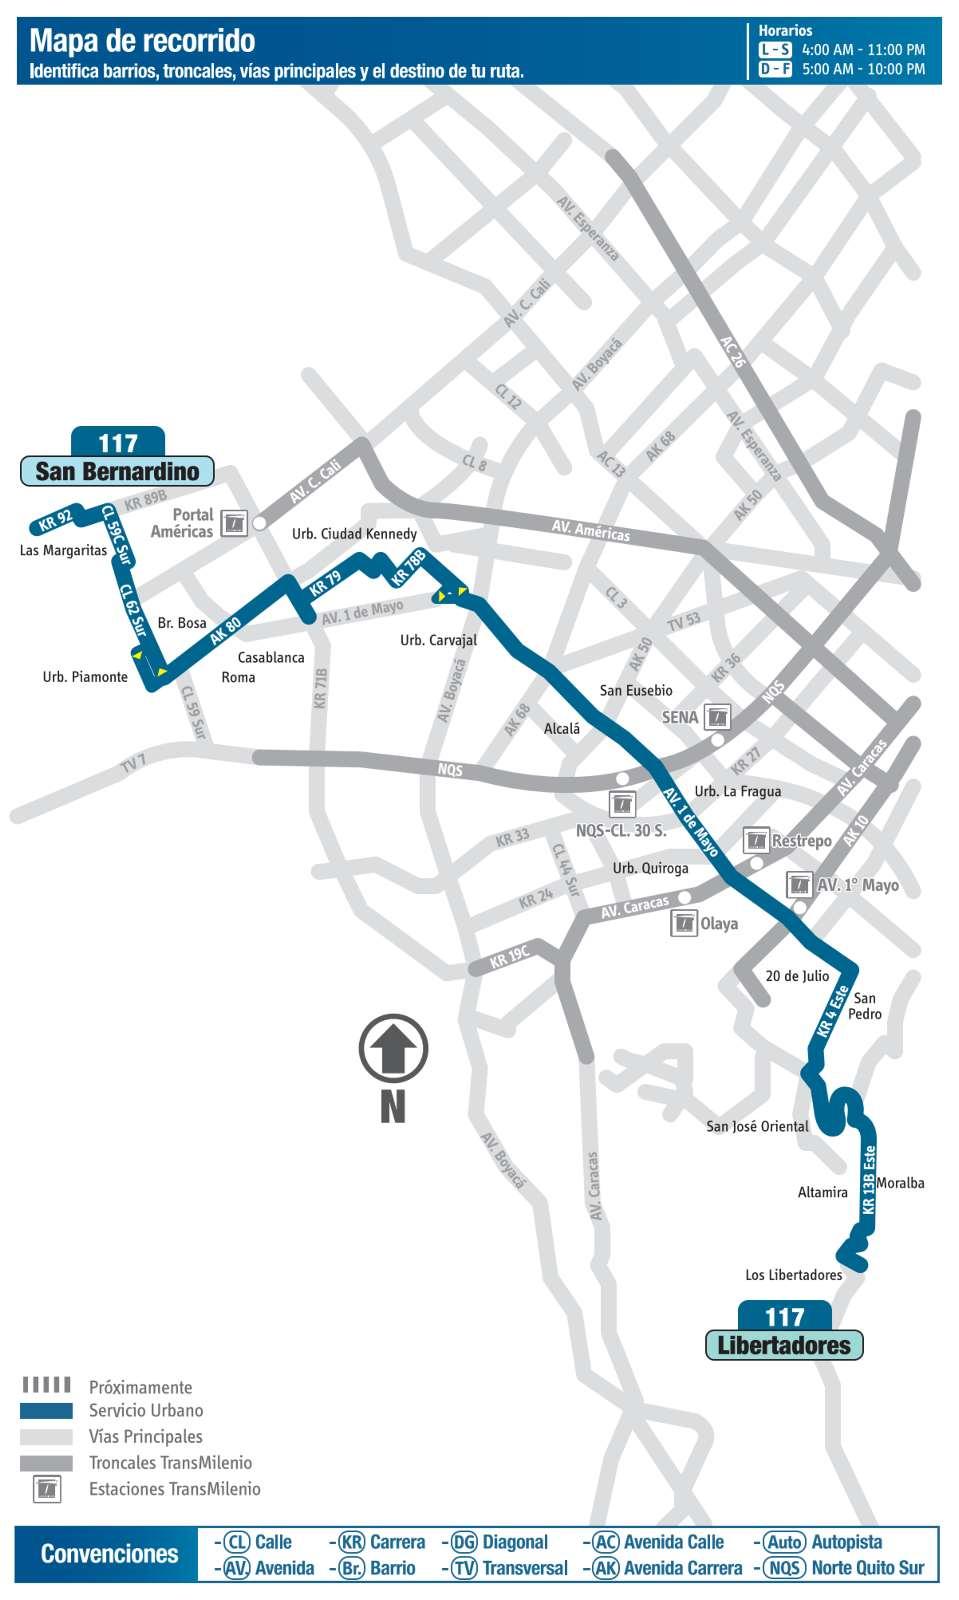 Ruta SITP: 117 San bernardino ↔ Los libertadores (mapa)